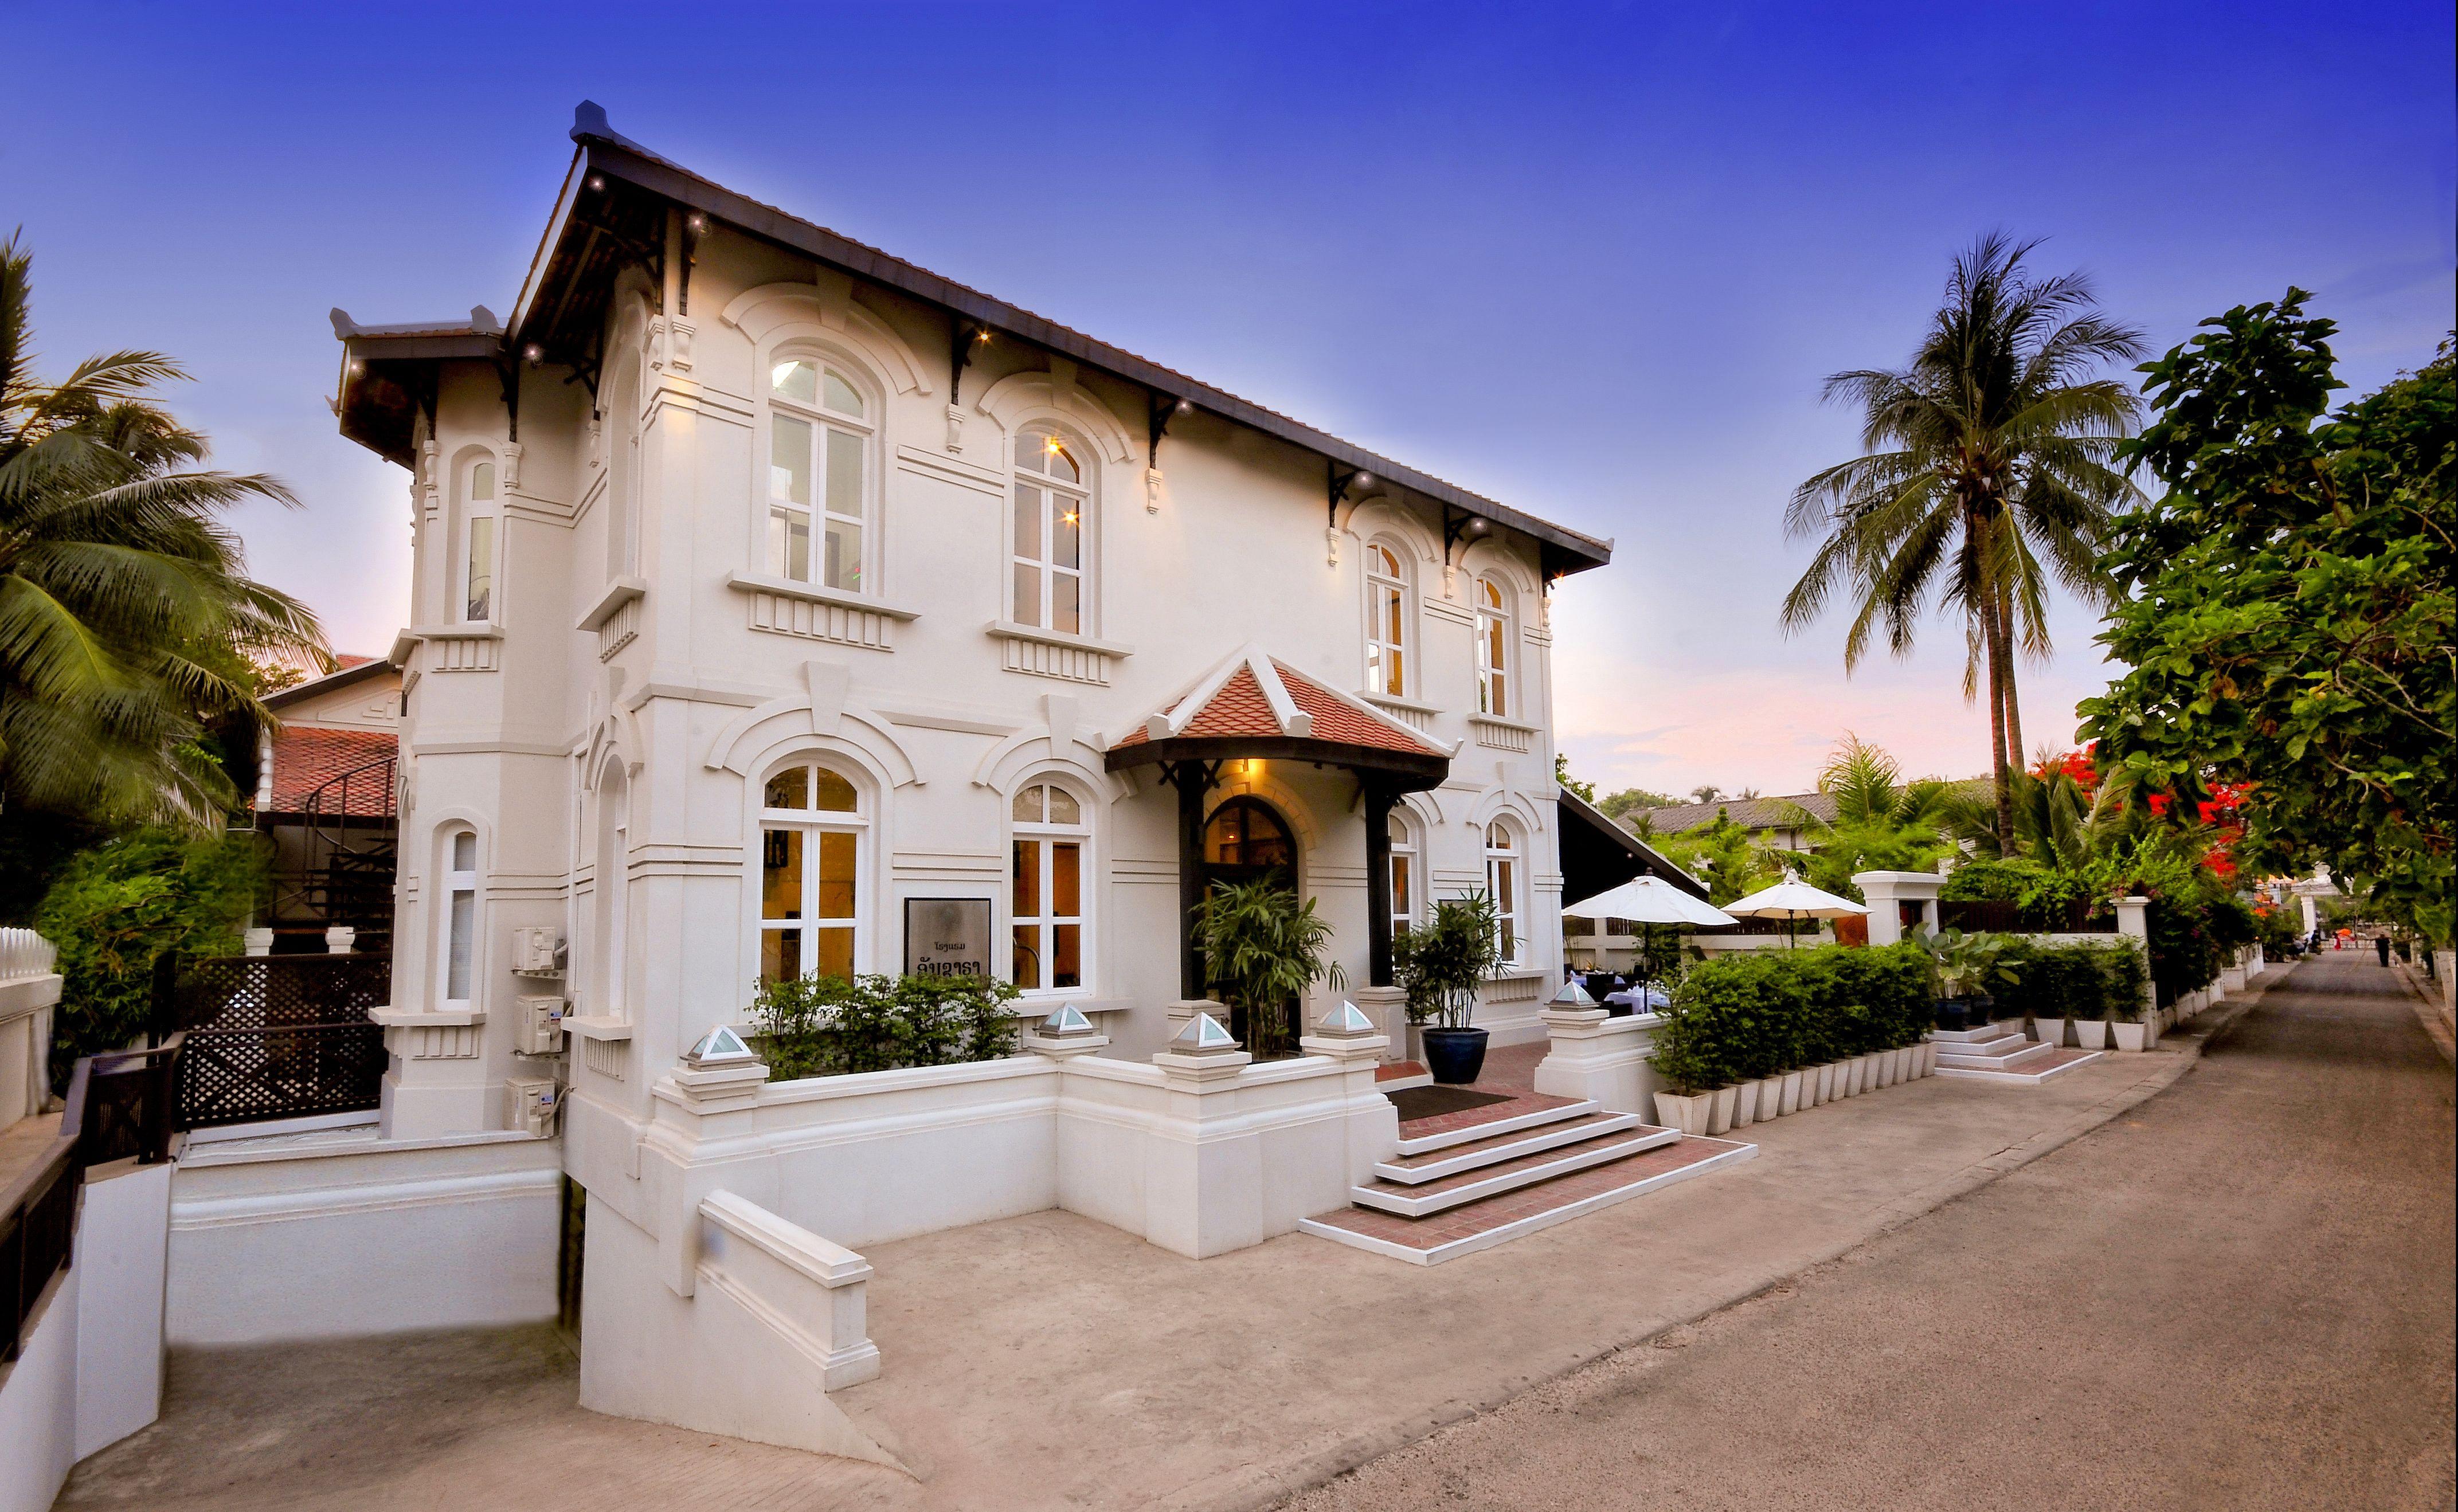 Kolonialstil Le ansara hotel charmantes haus im kolonialstil laos